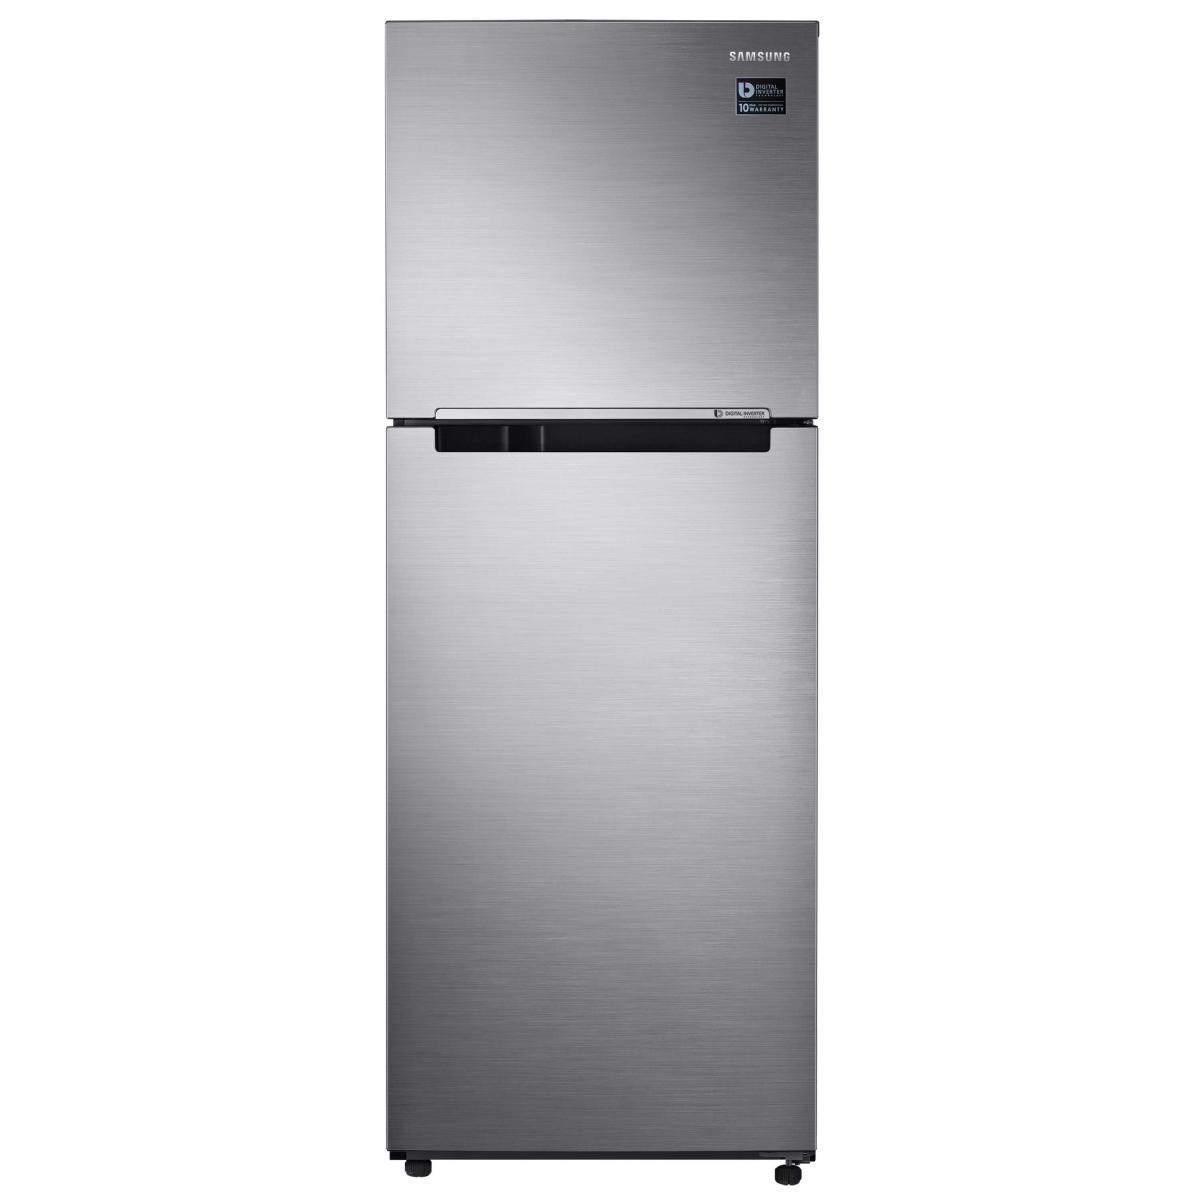 Samsung Réfrigérateur Combiné - RT29K5030S9